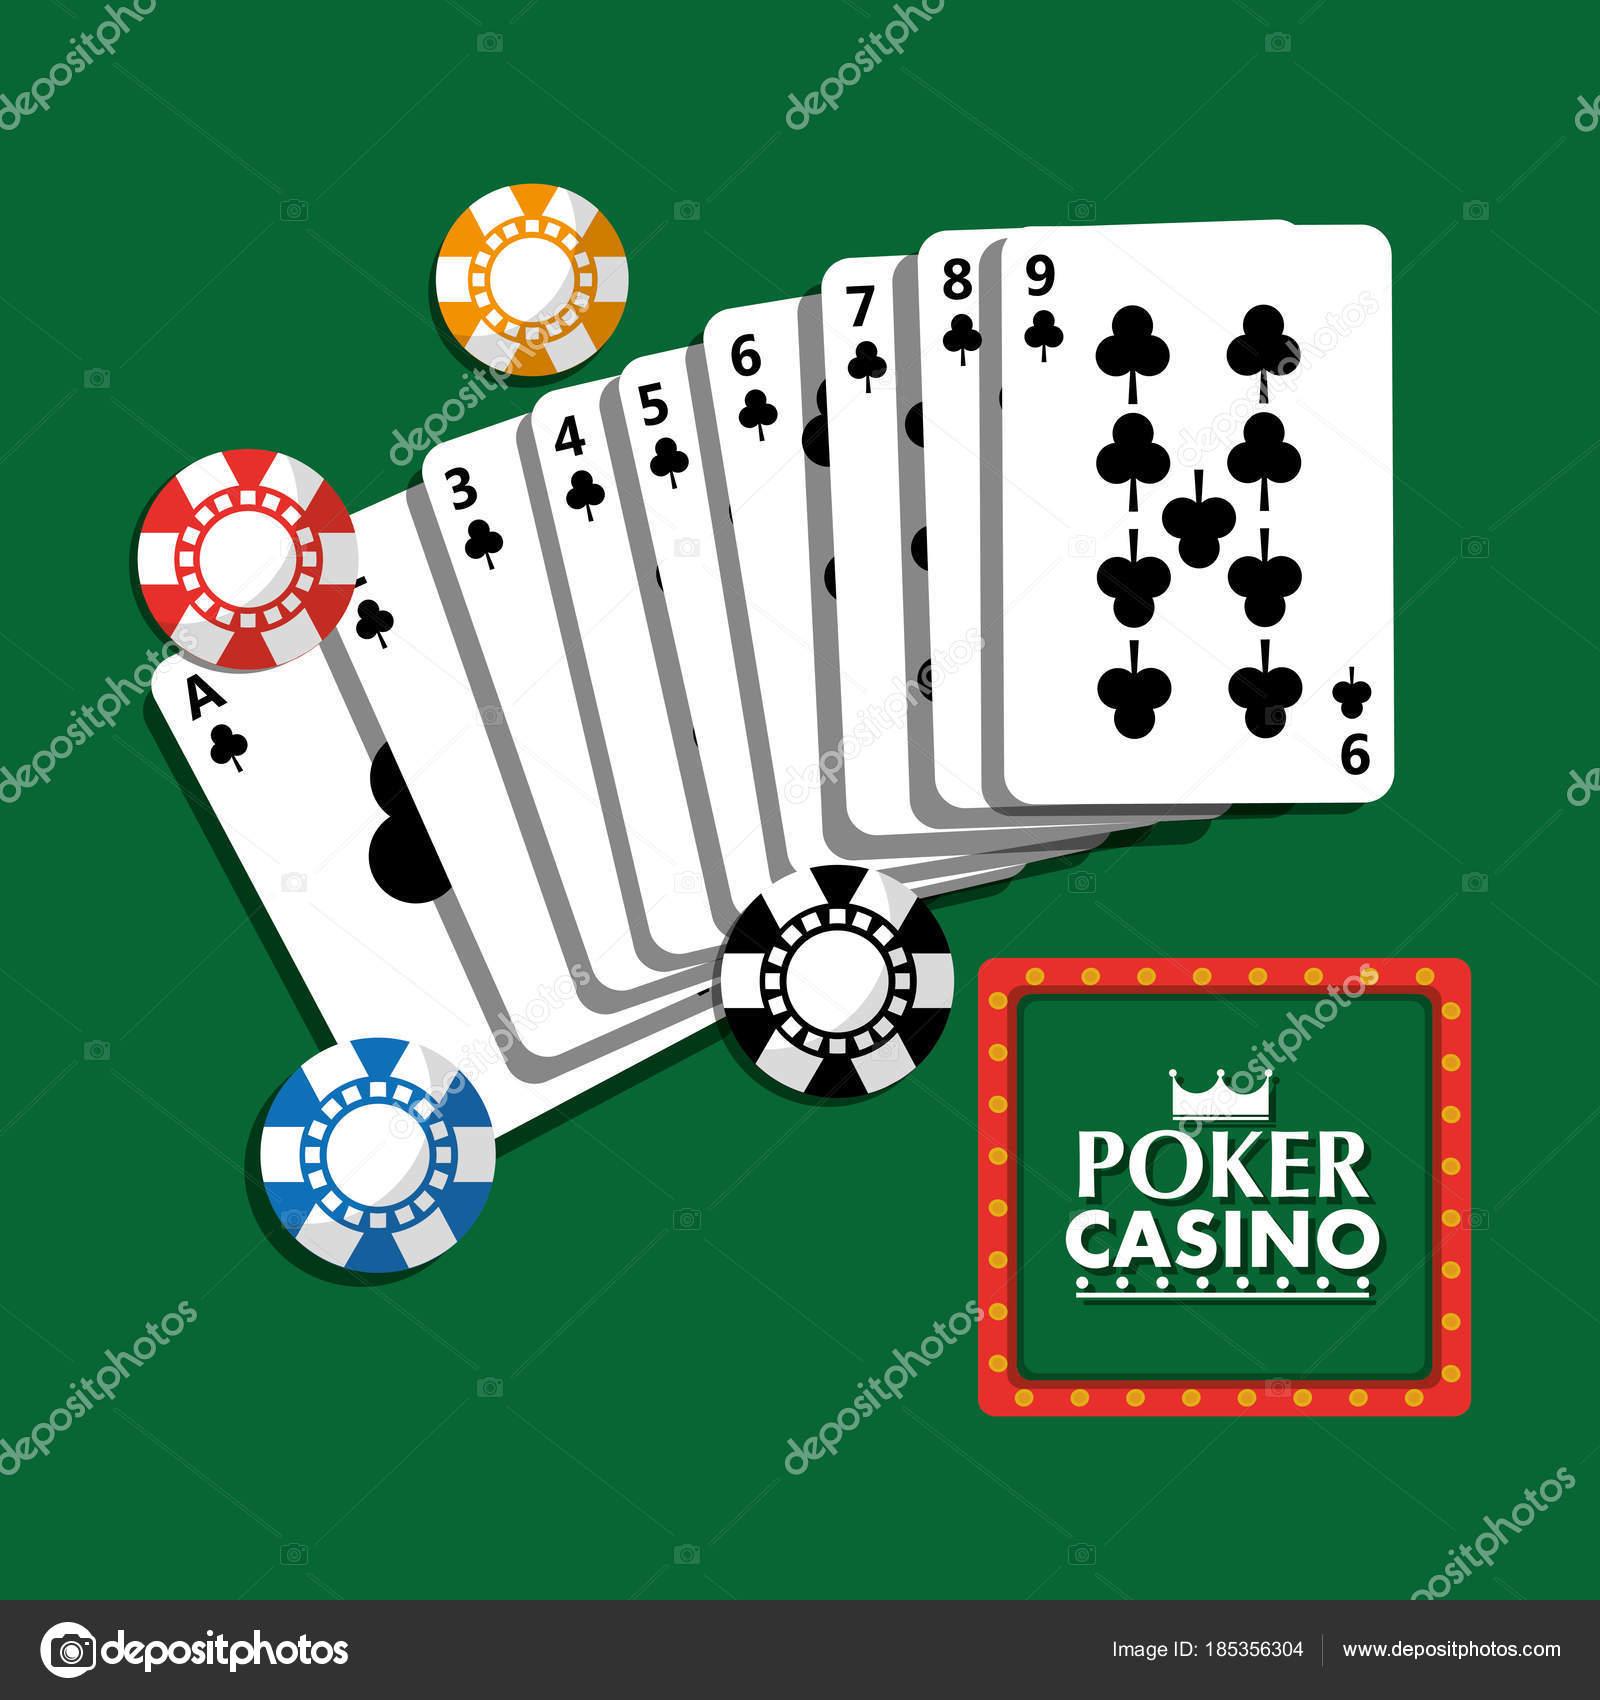 Poker Casino Billboard Plakat Cipy A Karty Bohatstvi Hazard Stock